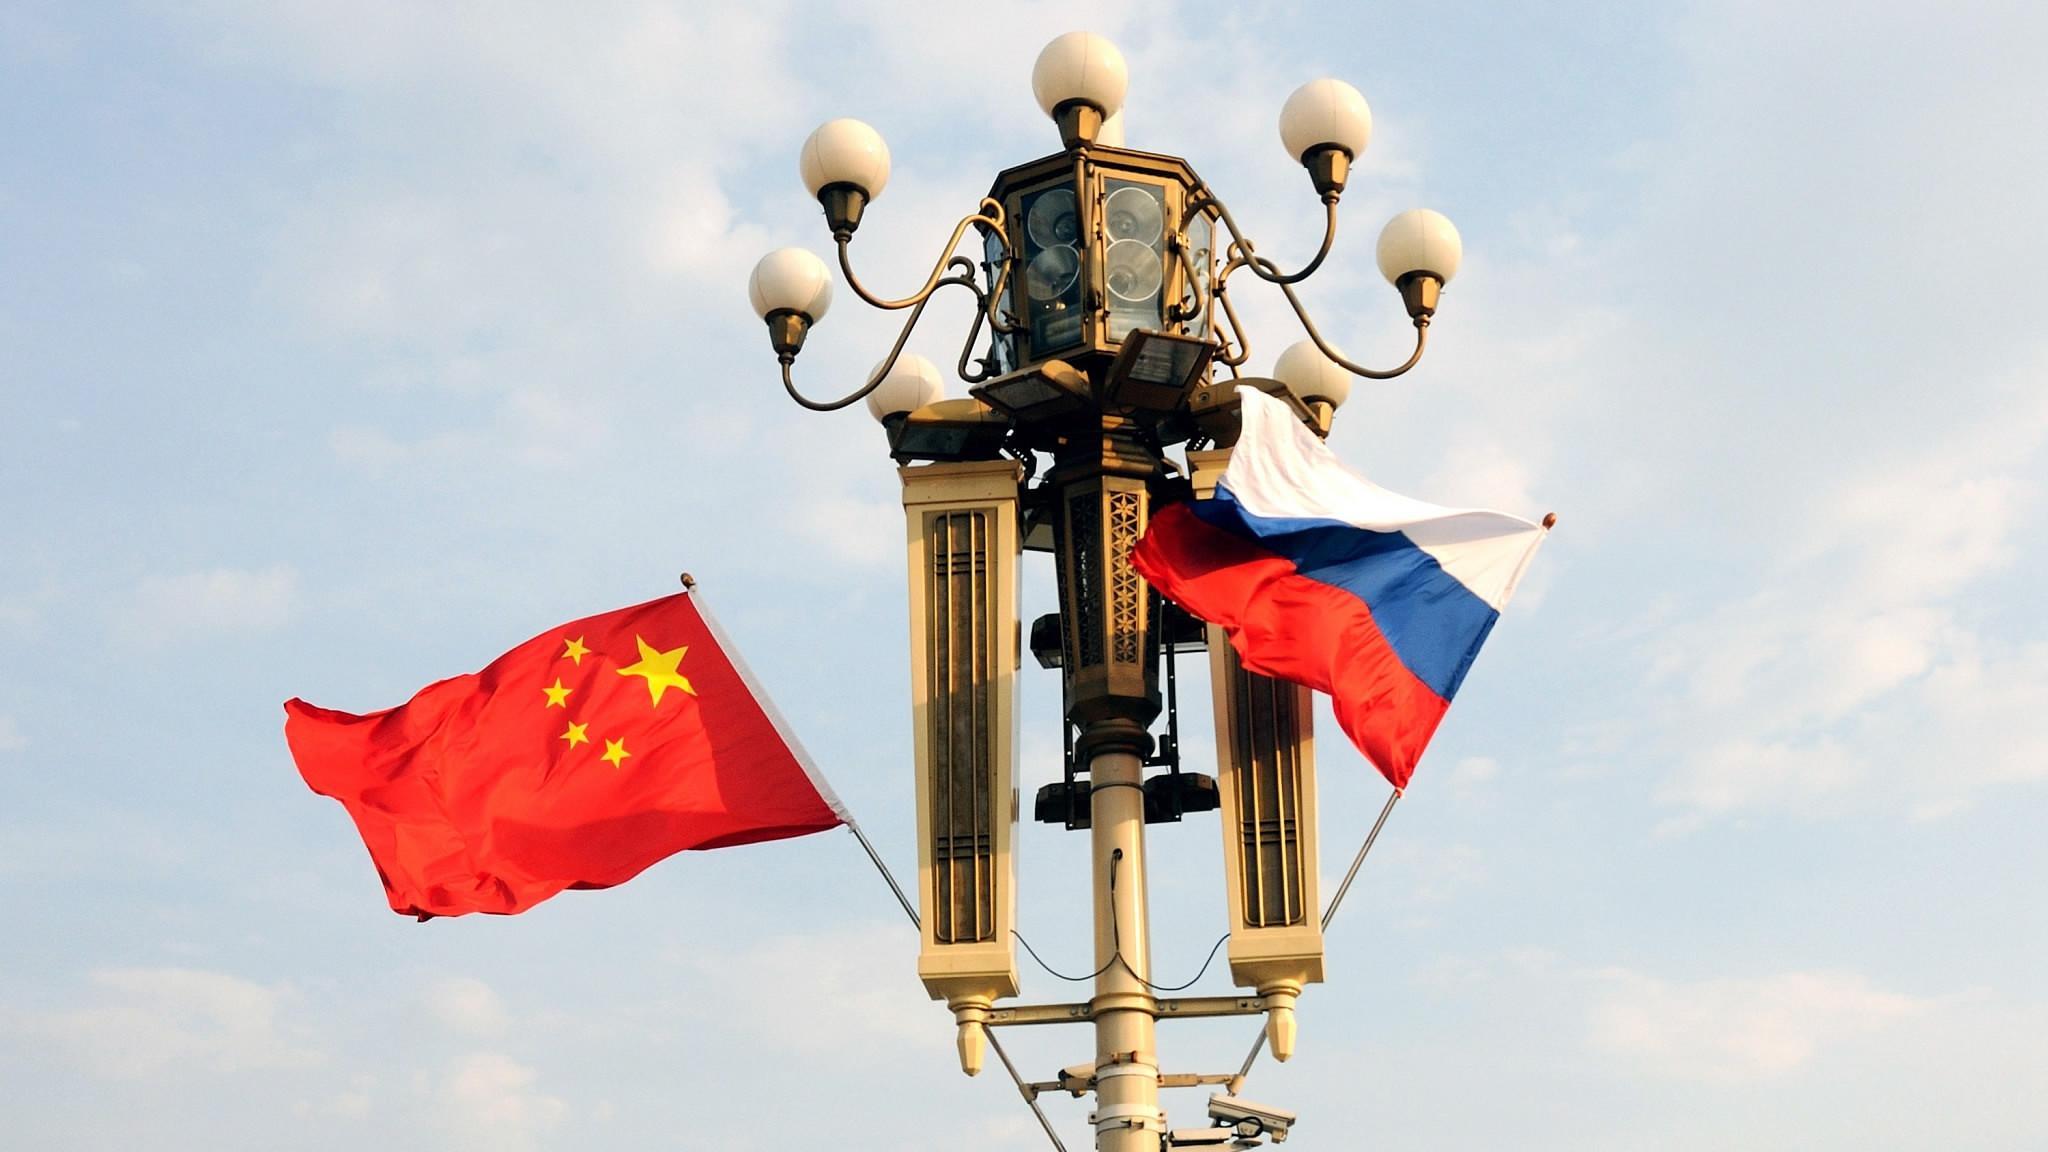 China, Russia benefit from good neighborliness, says ambassador